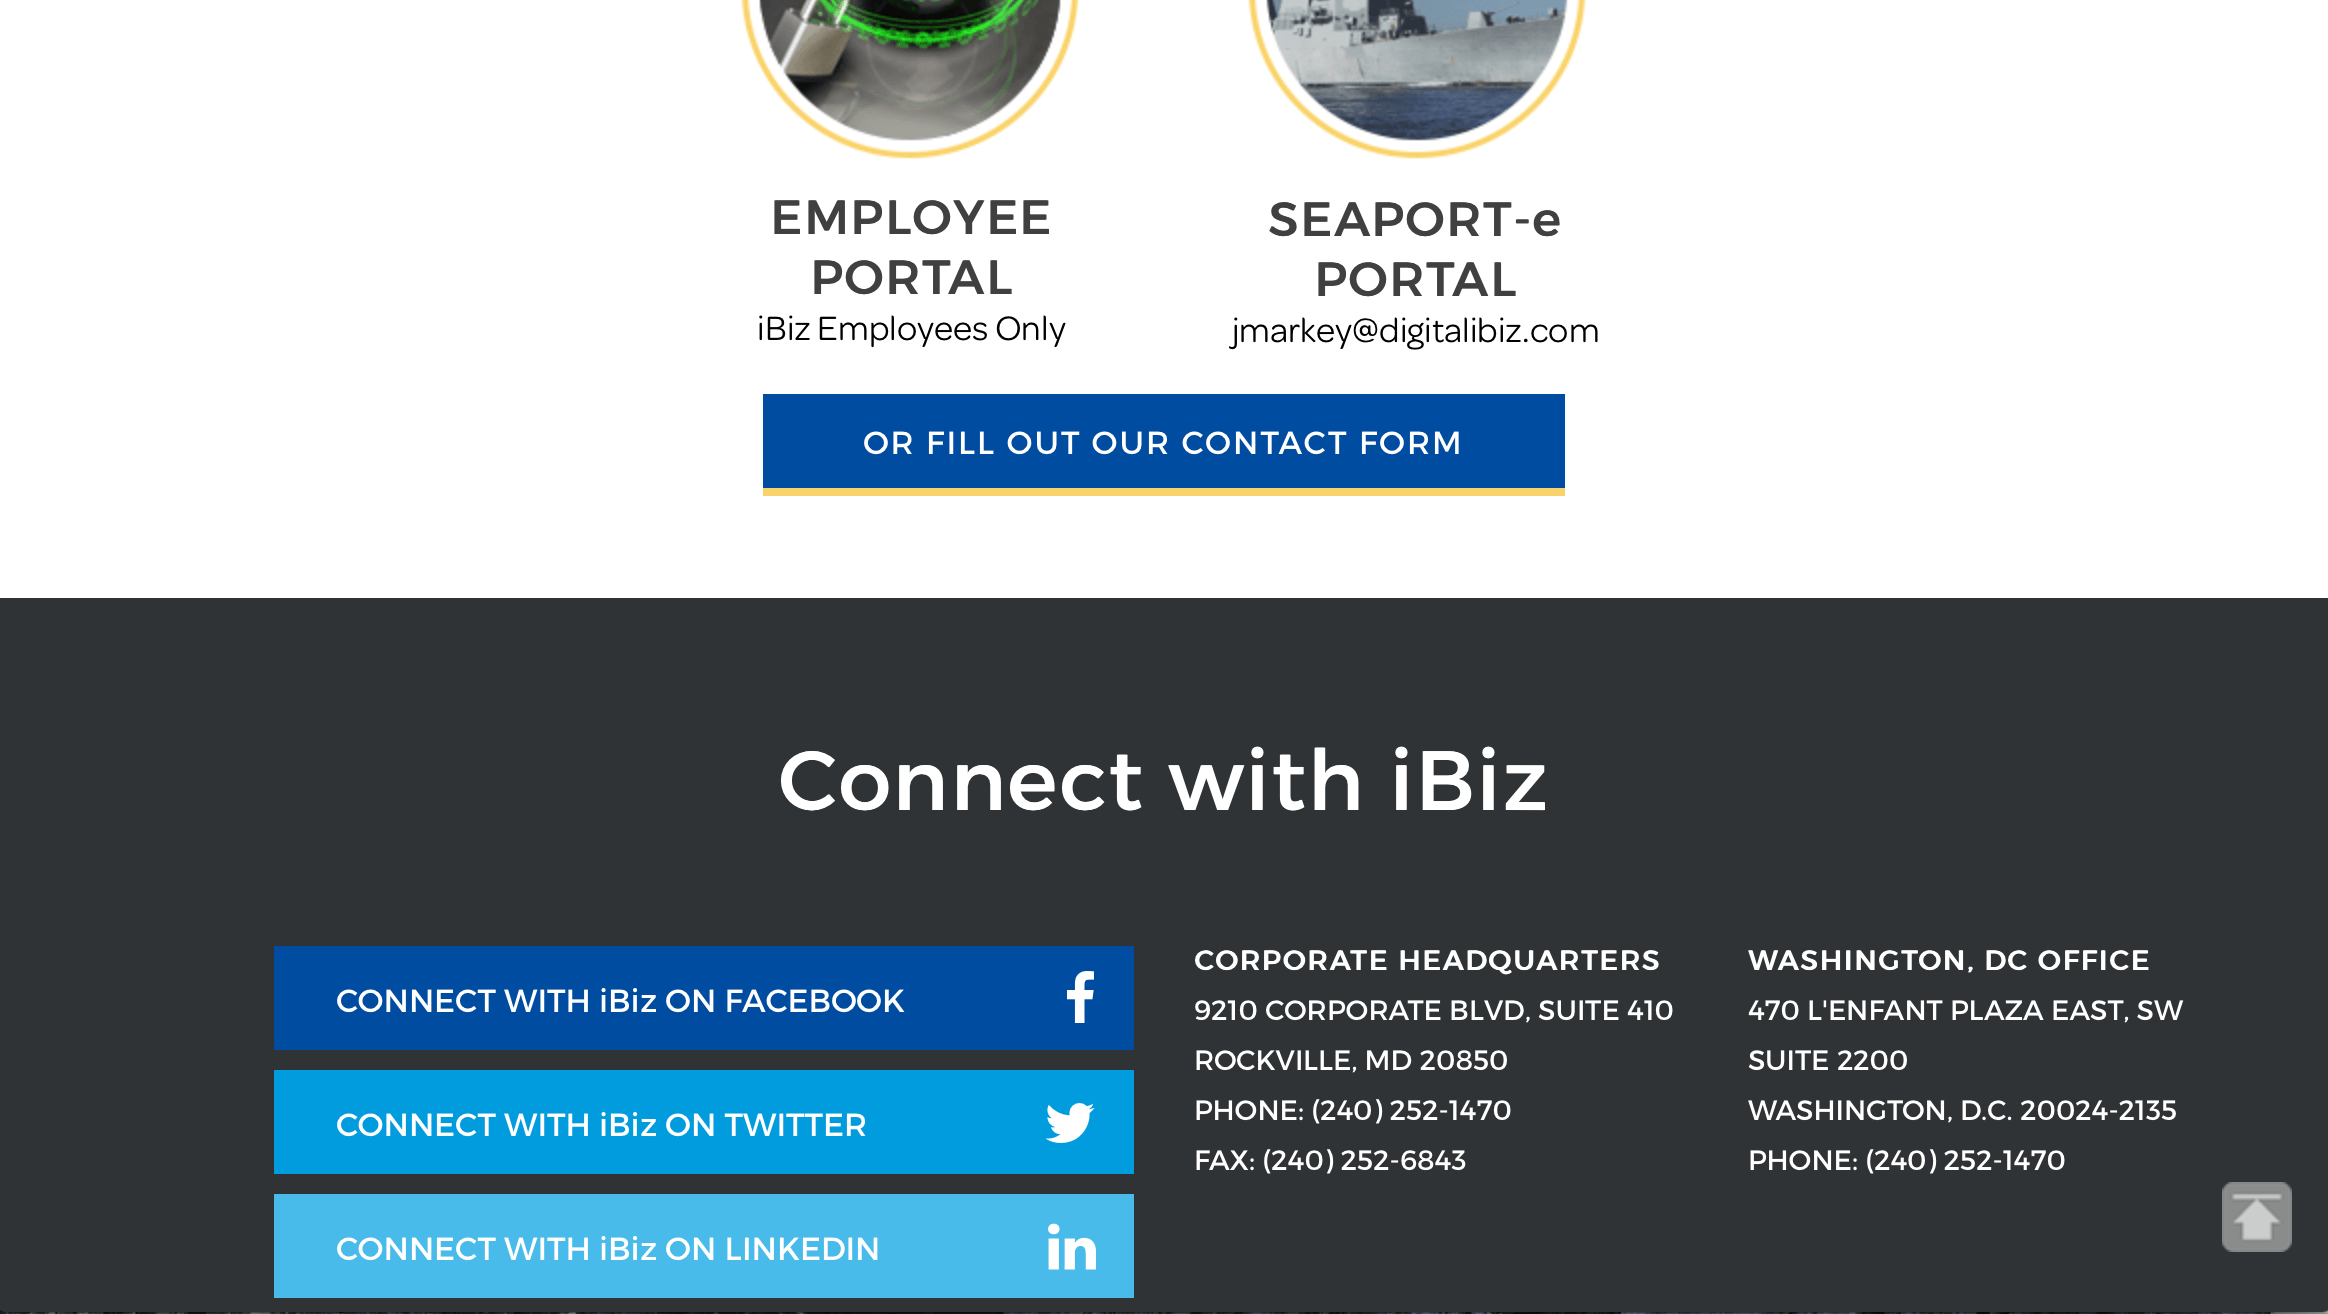 DIGITALiBiz_Inc___iBiz____Contact_US_and_Microsoft_Word